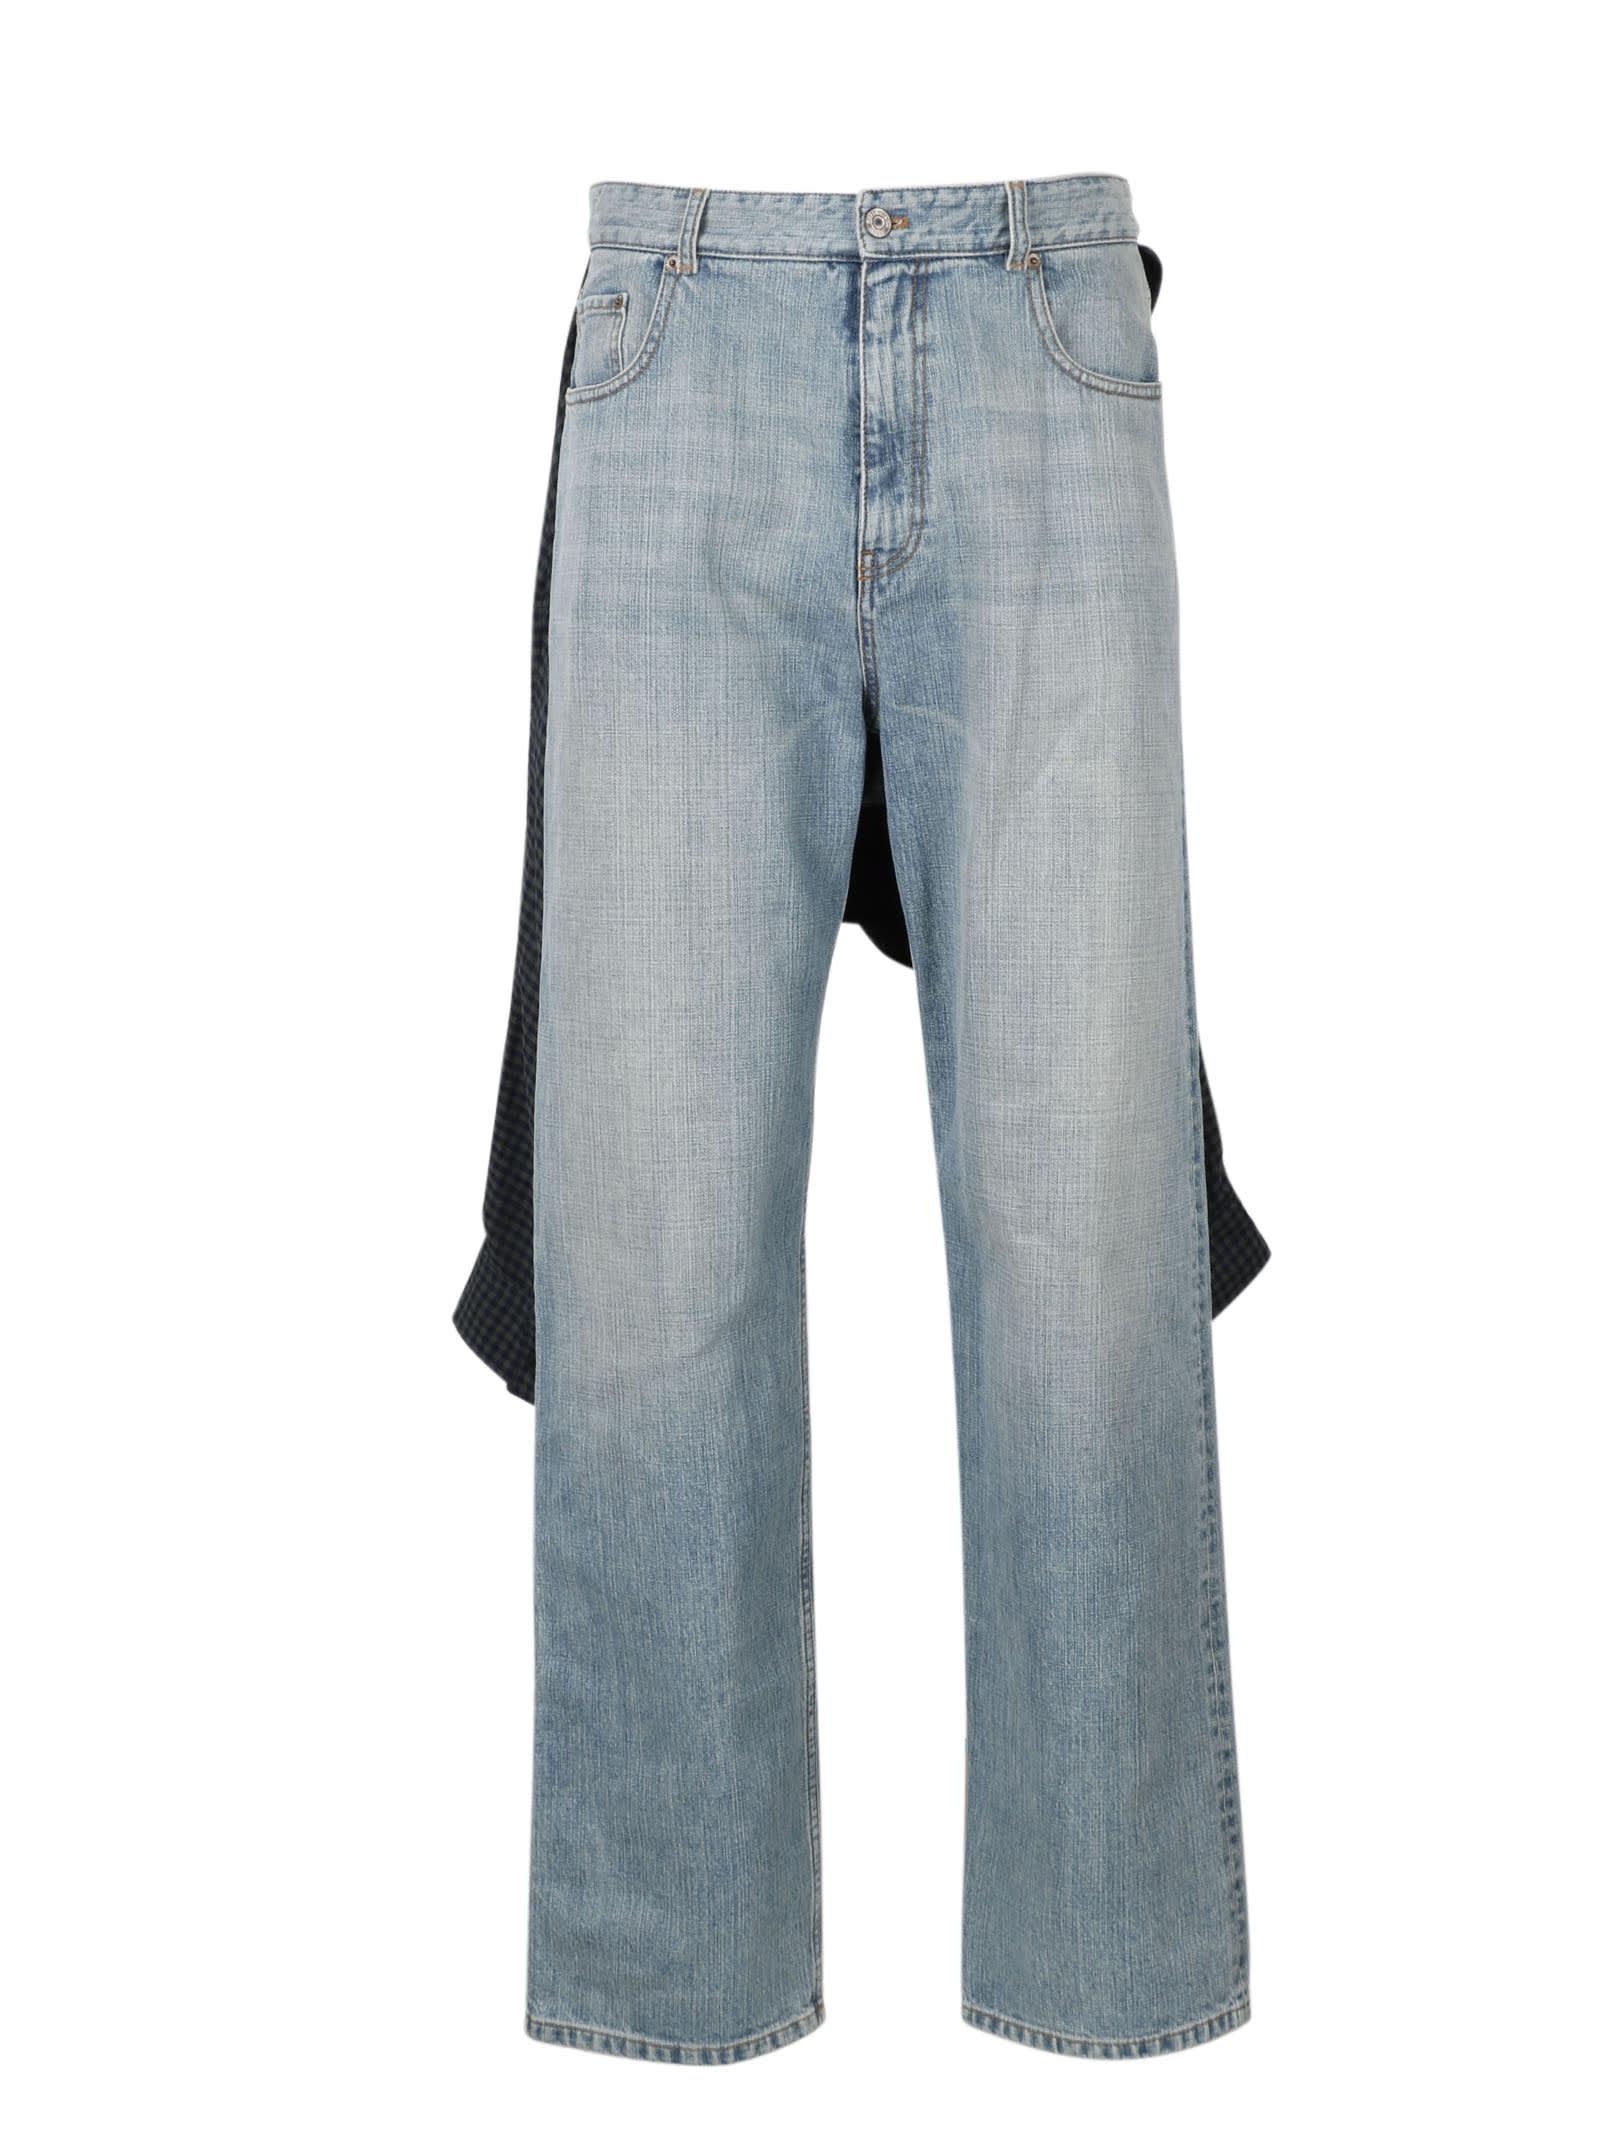 Balenciaga Hybrid Shirt Jeans